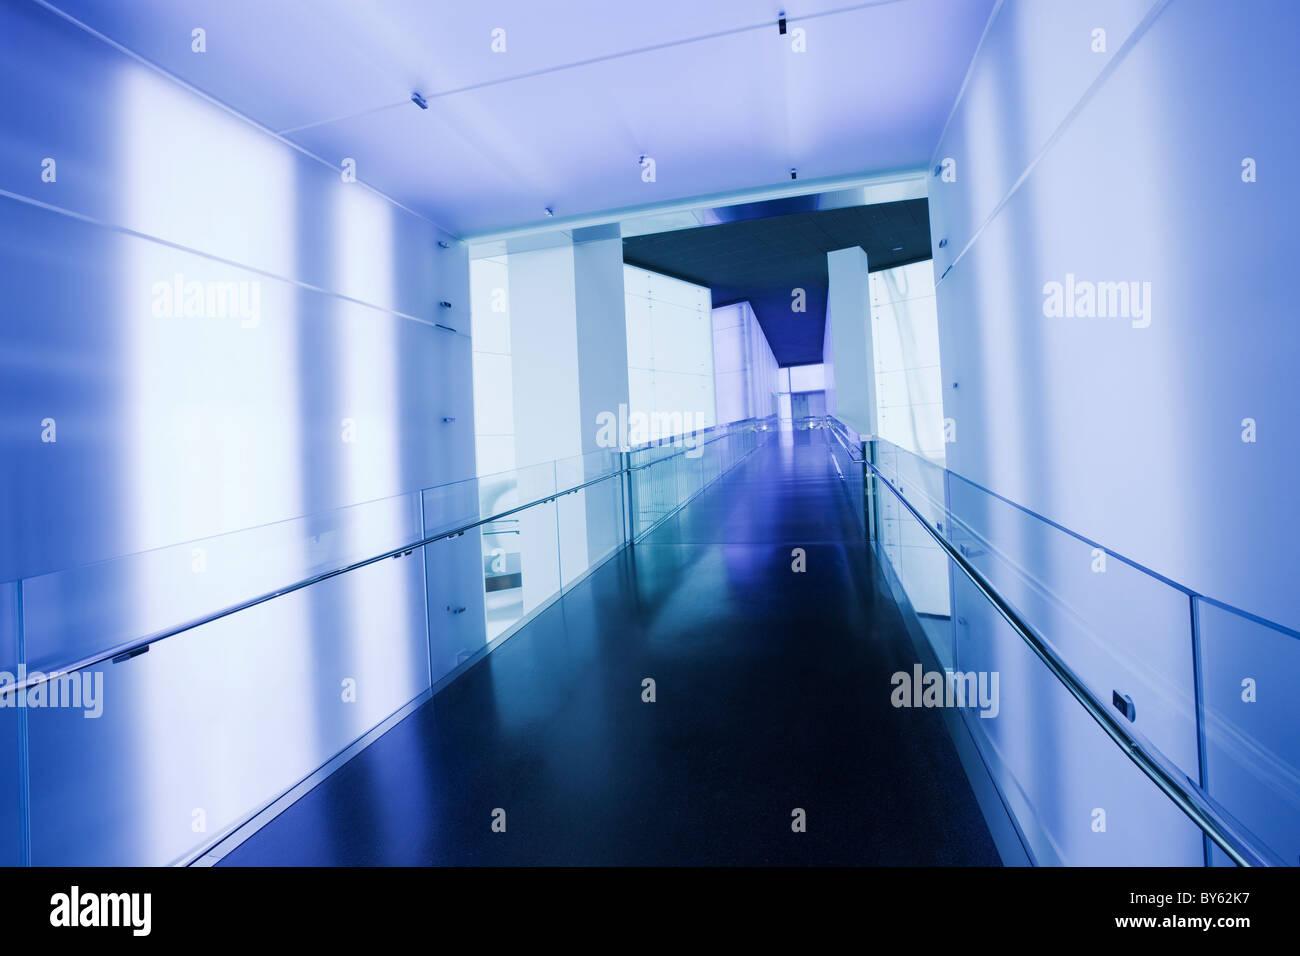 Germany,Bavaria,Munich, BMW Museum, corridor in blue tones - Stock Image